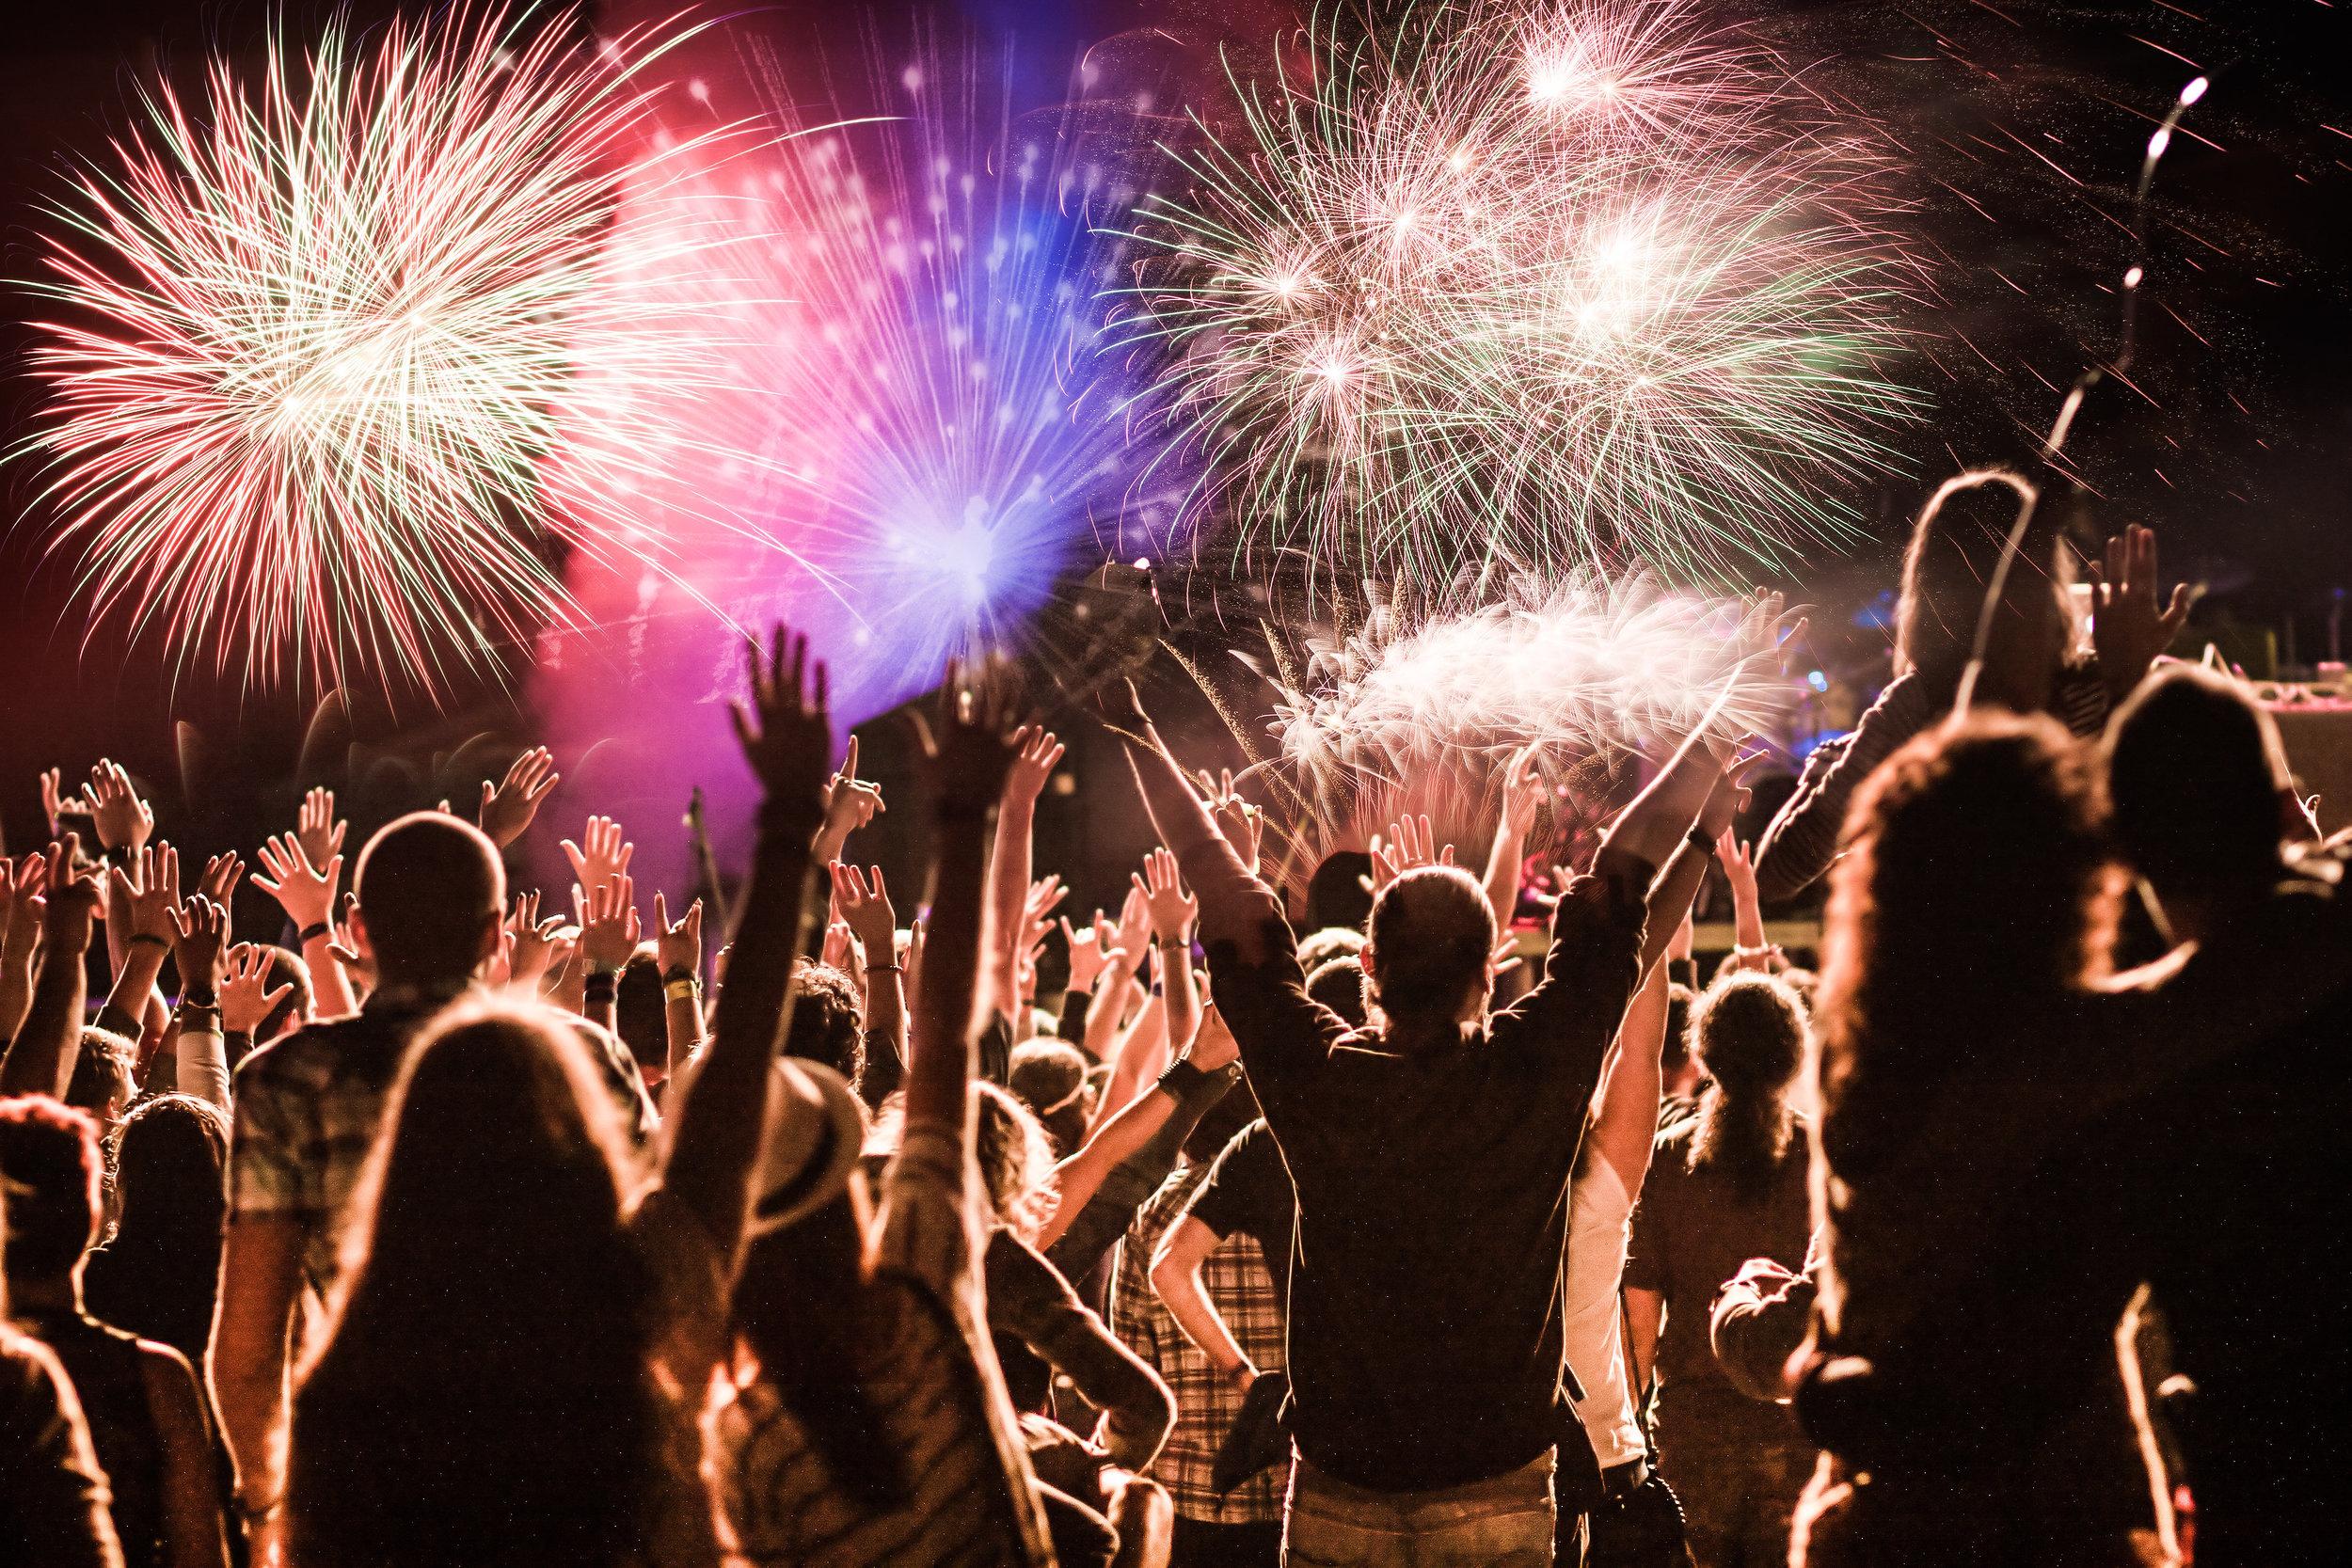 Fireworks at a rock concert.